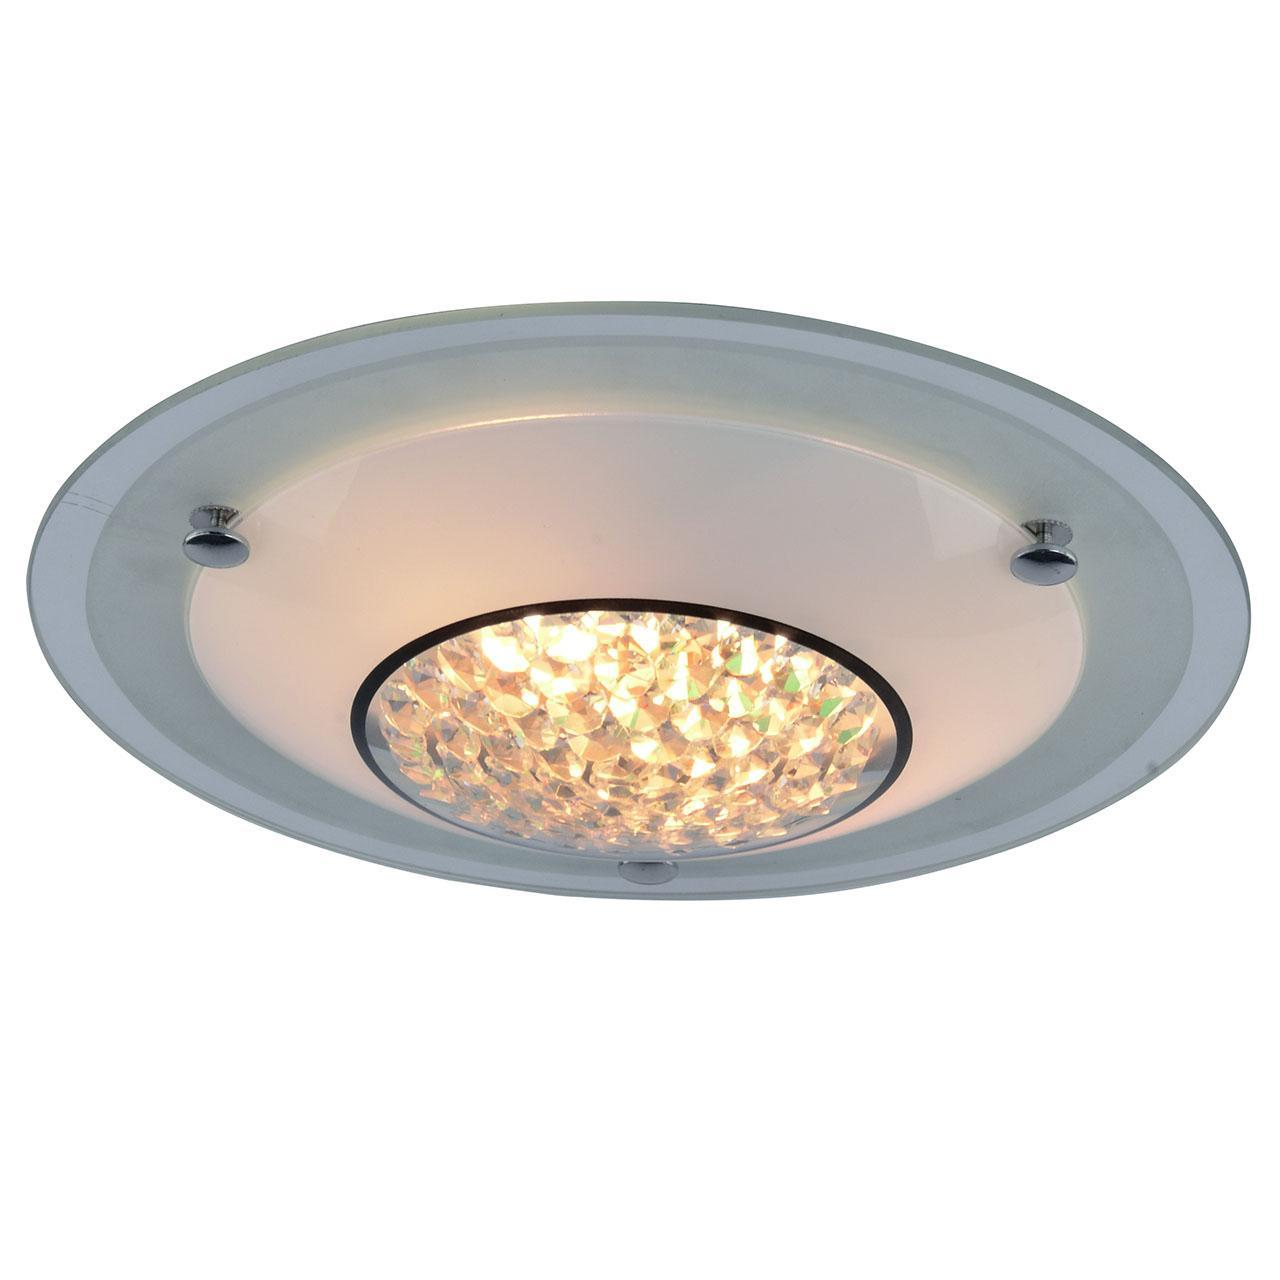 Потолочный светильник Arte Lamp A4833PL-2CC arte lamp giselle a4833pl 2cc